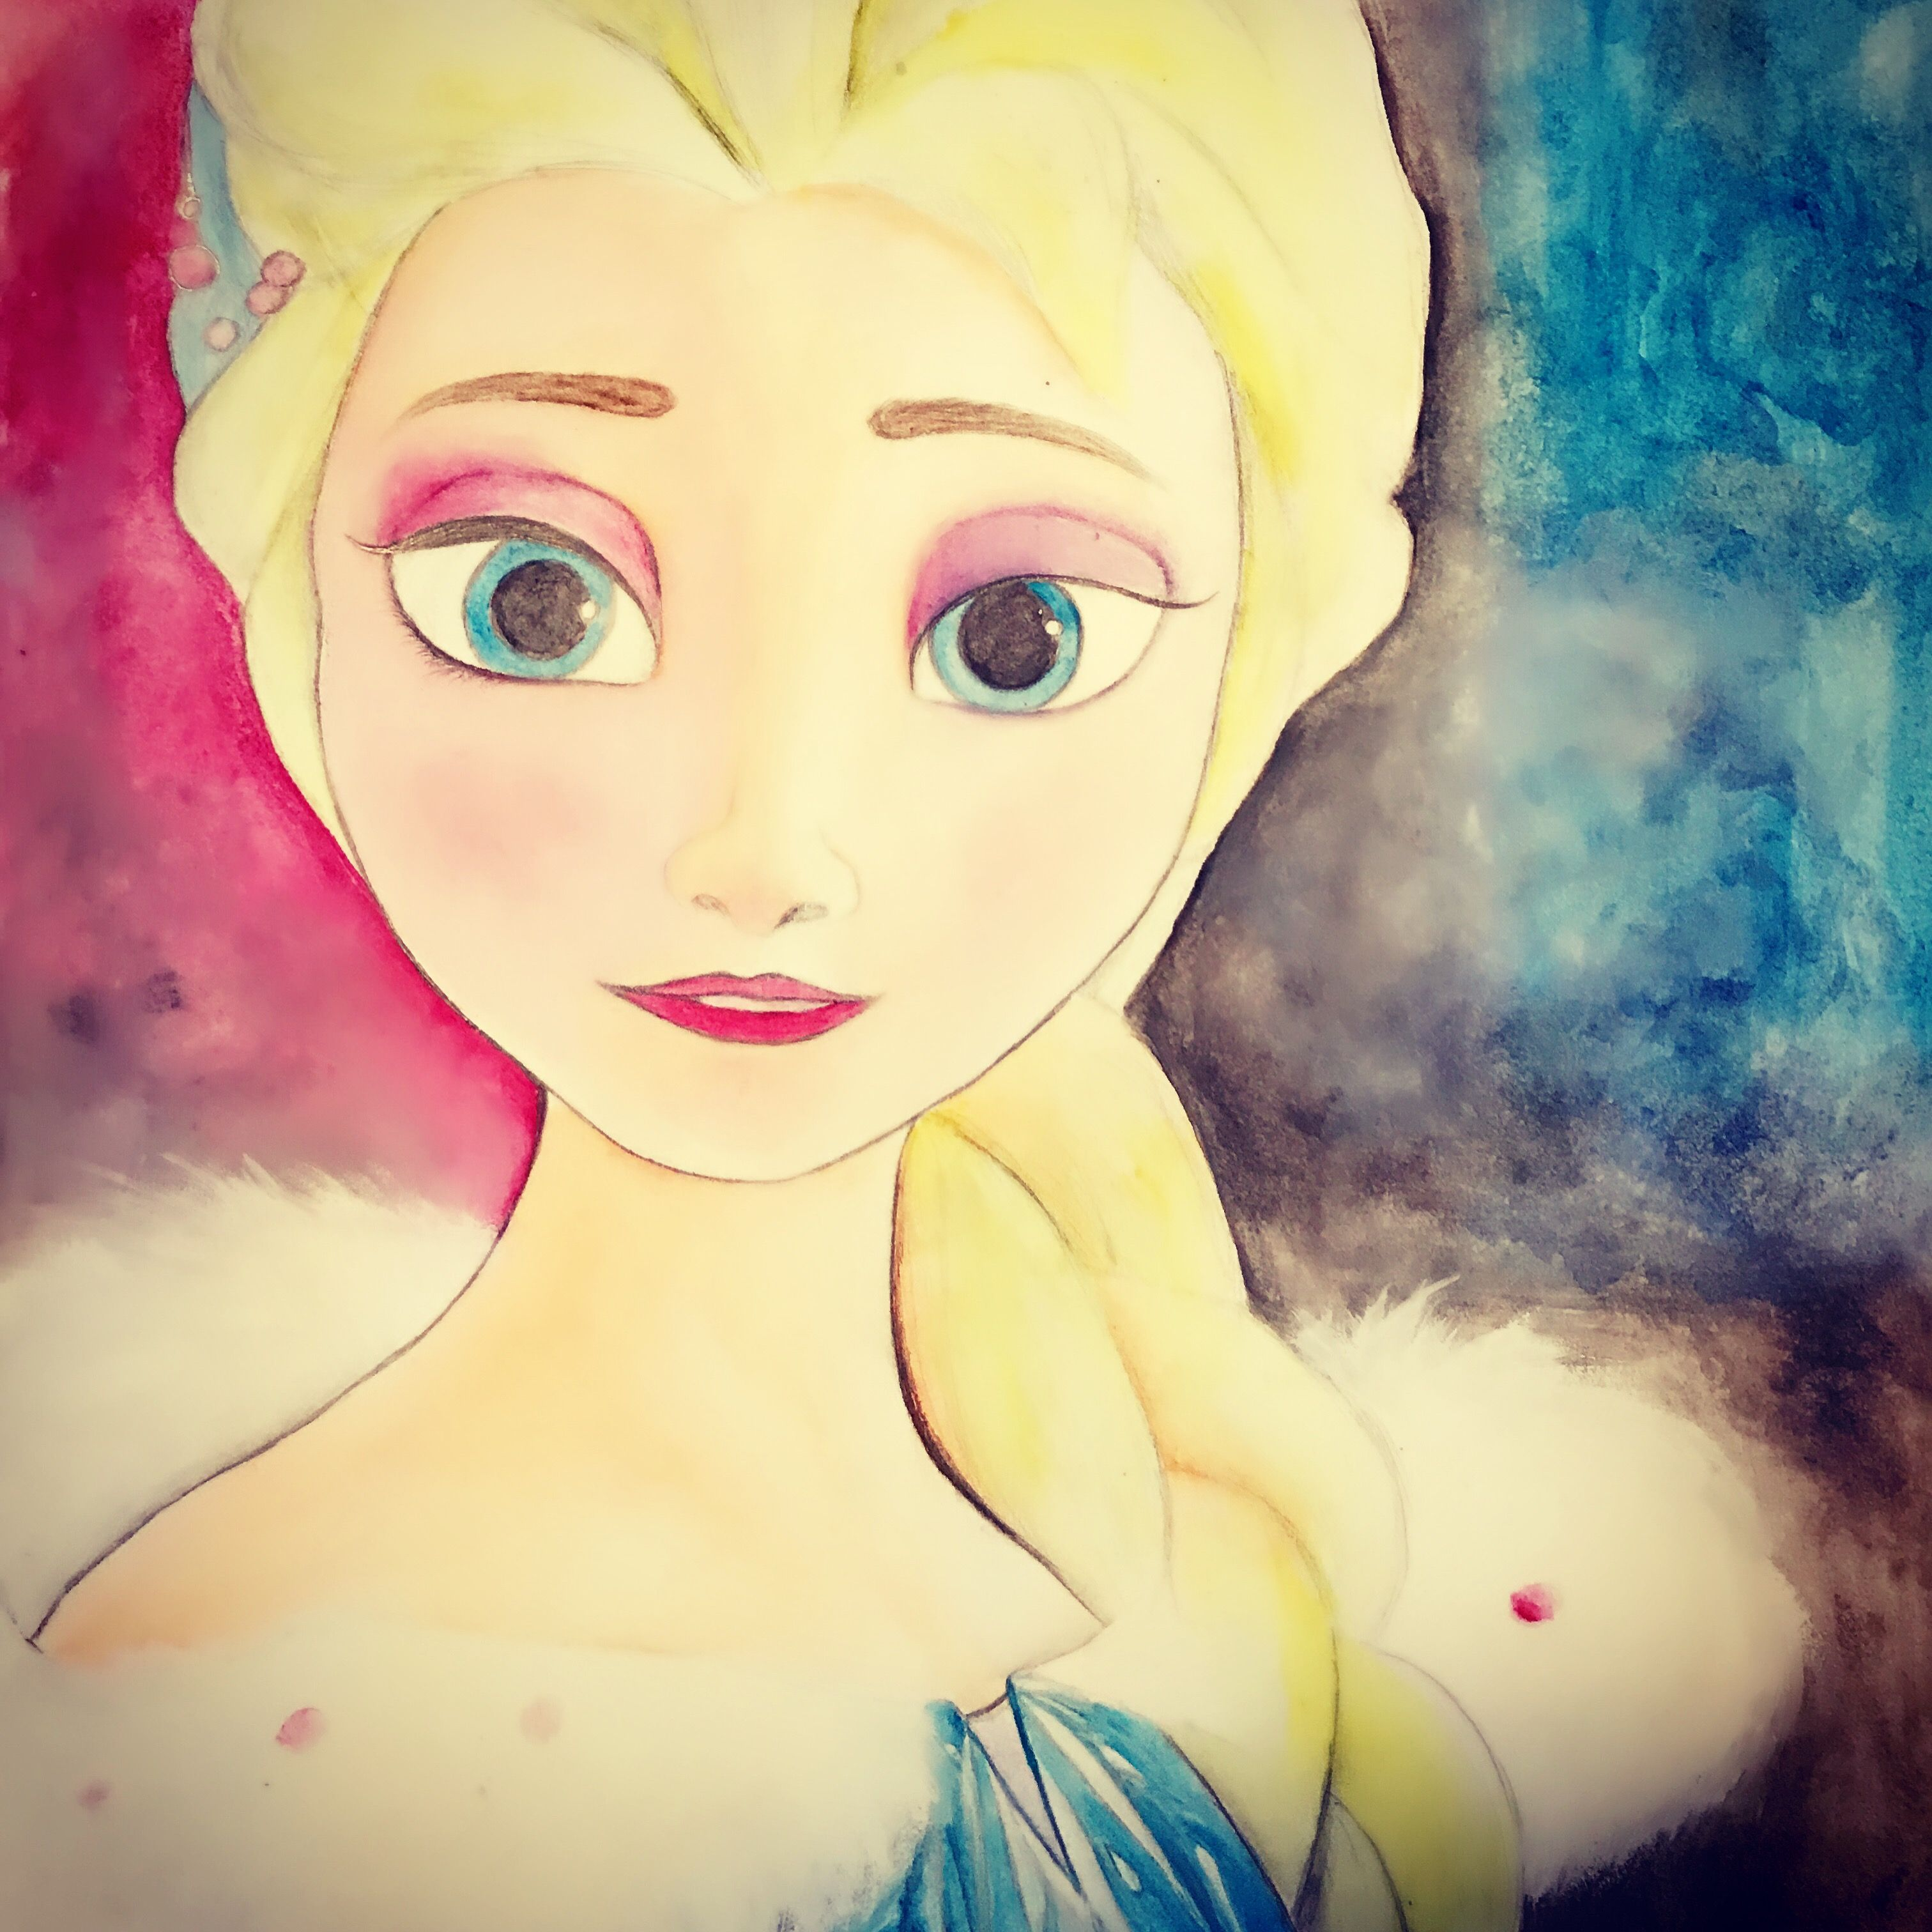 Elsa #Frozen #Disney #Olaf\'sFrozenAdventure #watercolor | My Art ...